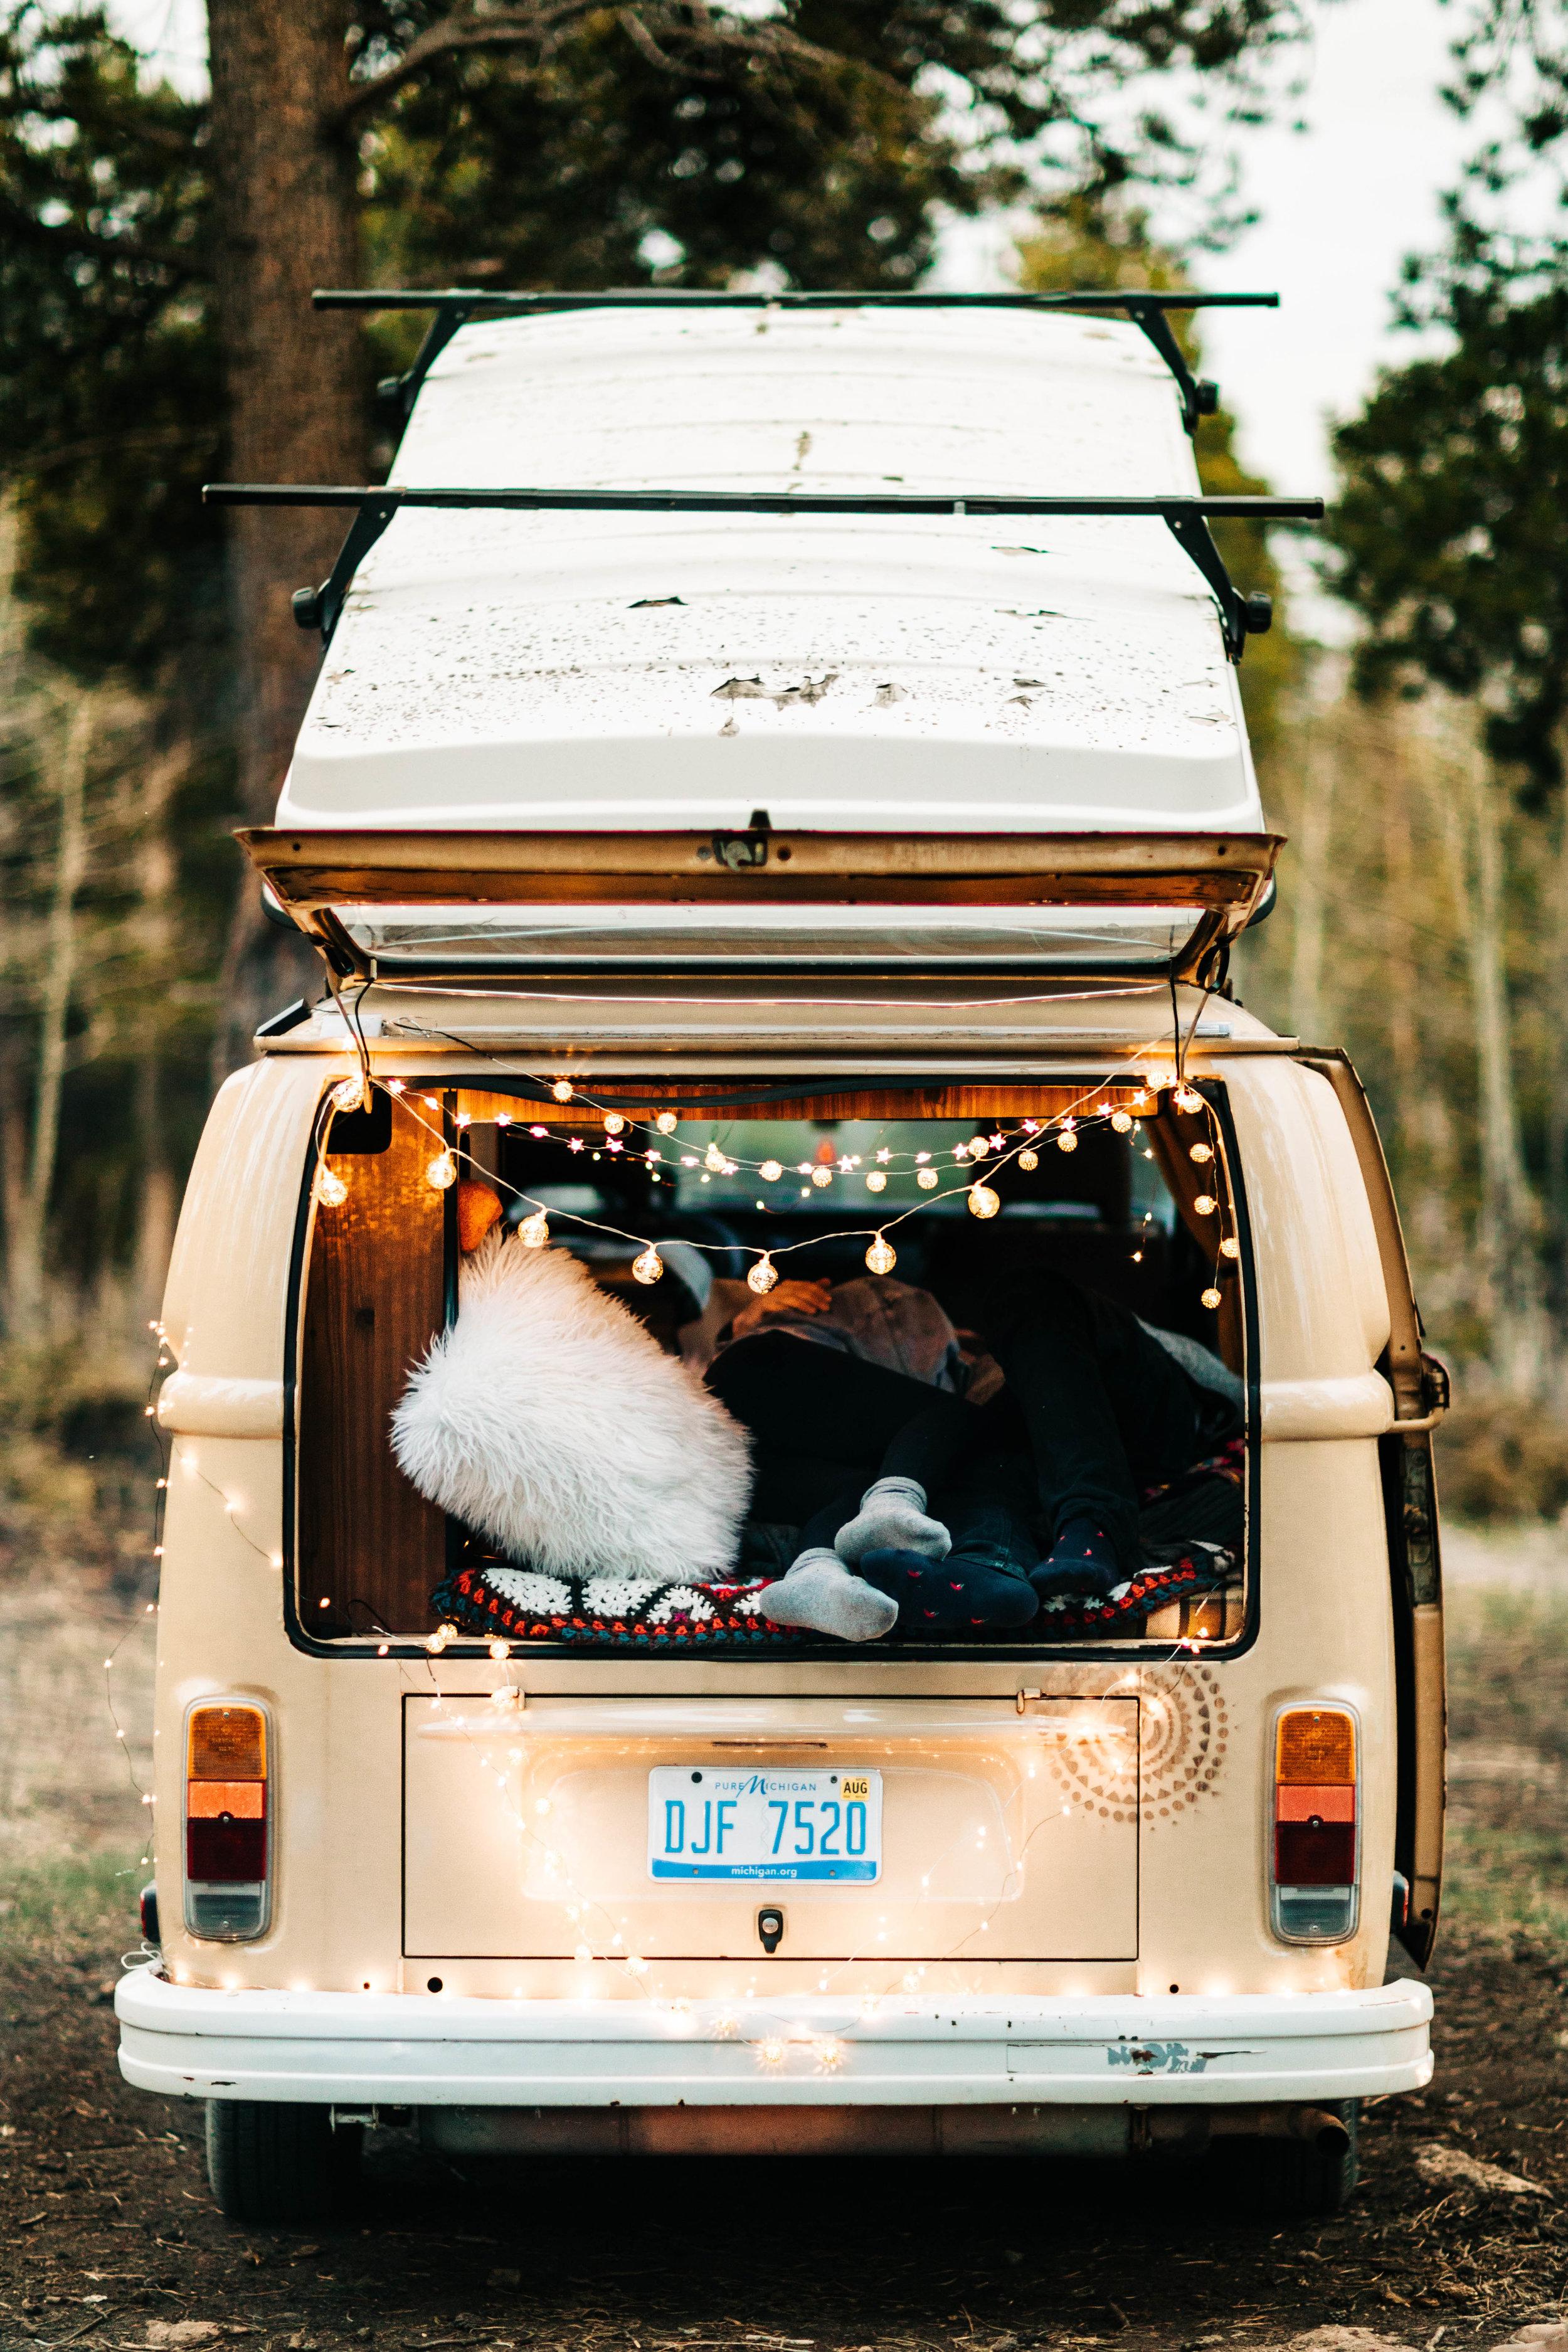 elopement photos inside a vintage camper van | traveling adventure elopement photographers